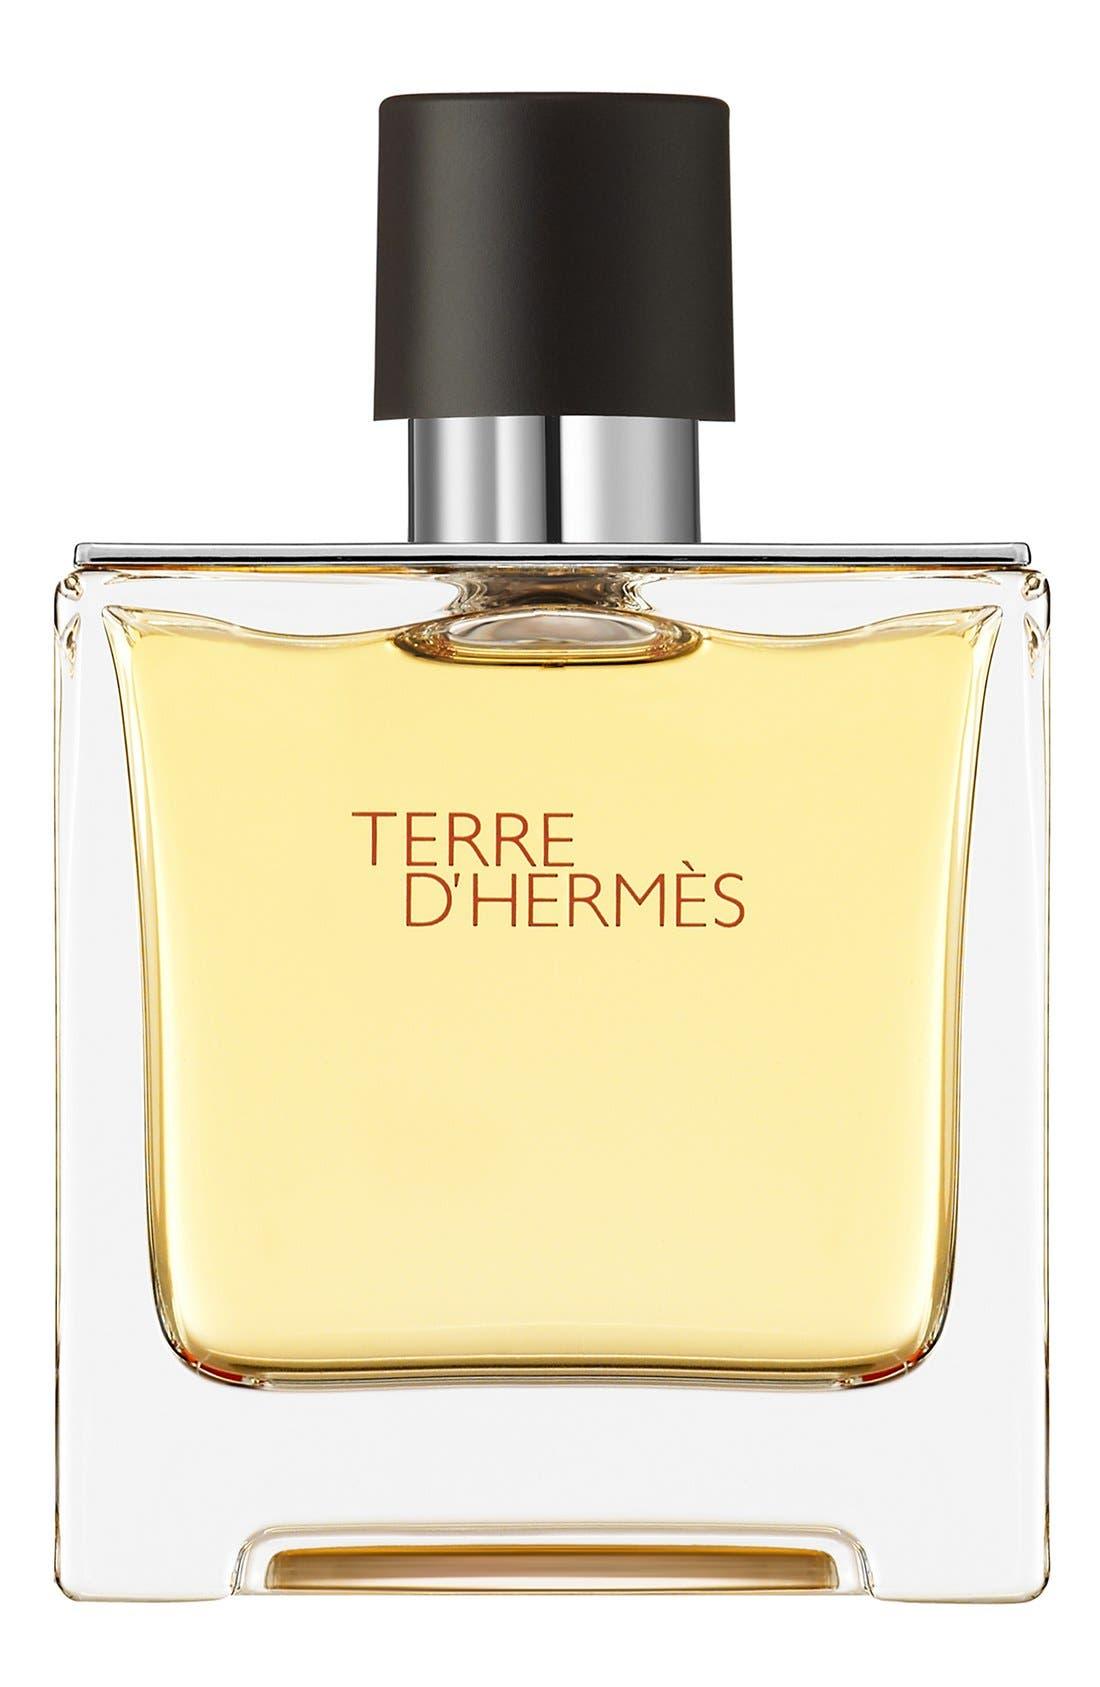 Terre d'Hermès - Pure perfume,                             Main thumbnail 1, color,                             NO COLOR